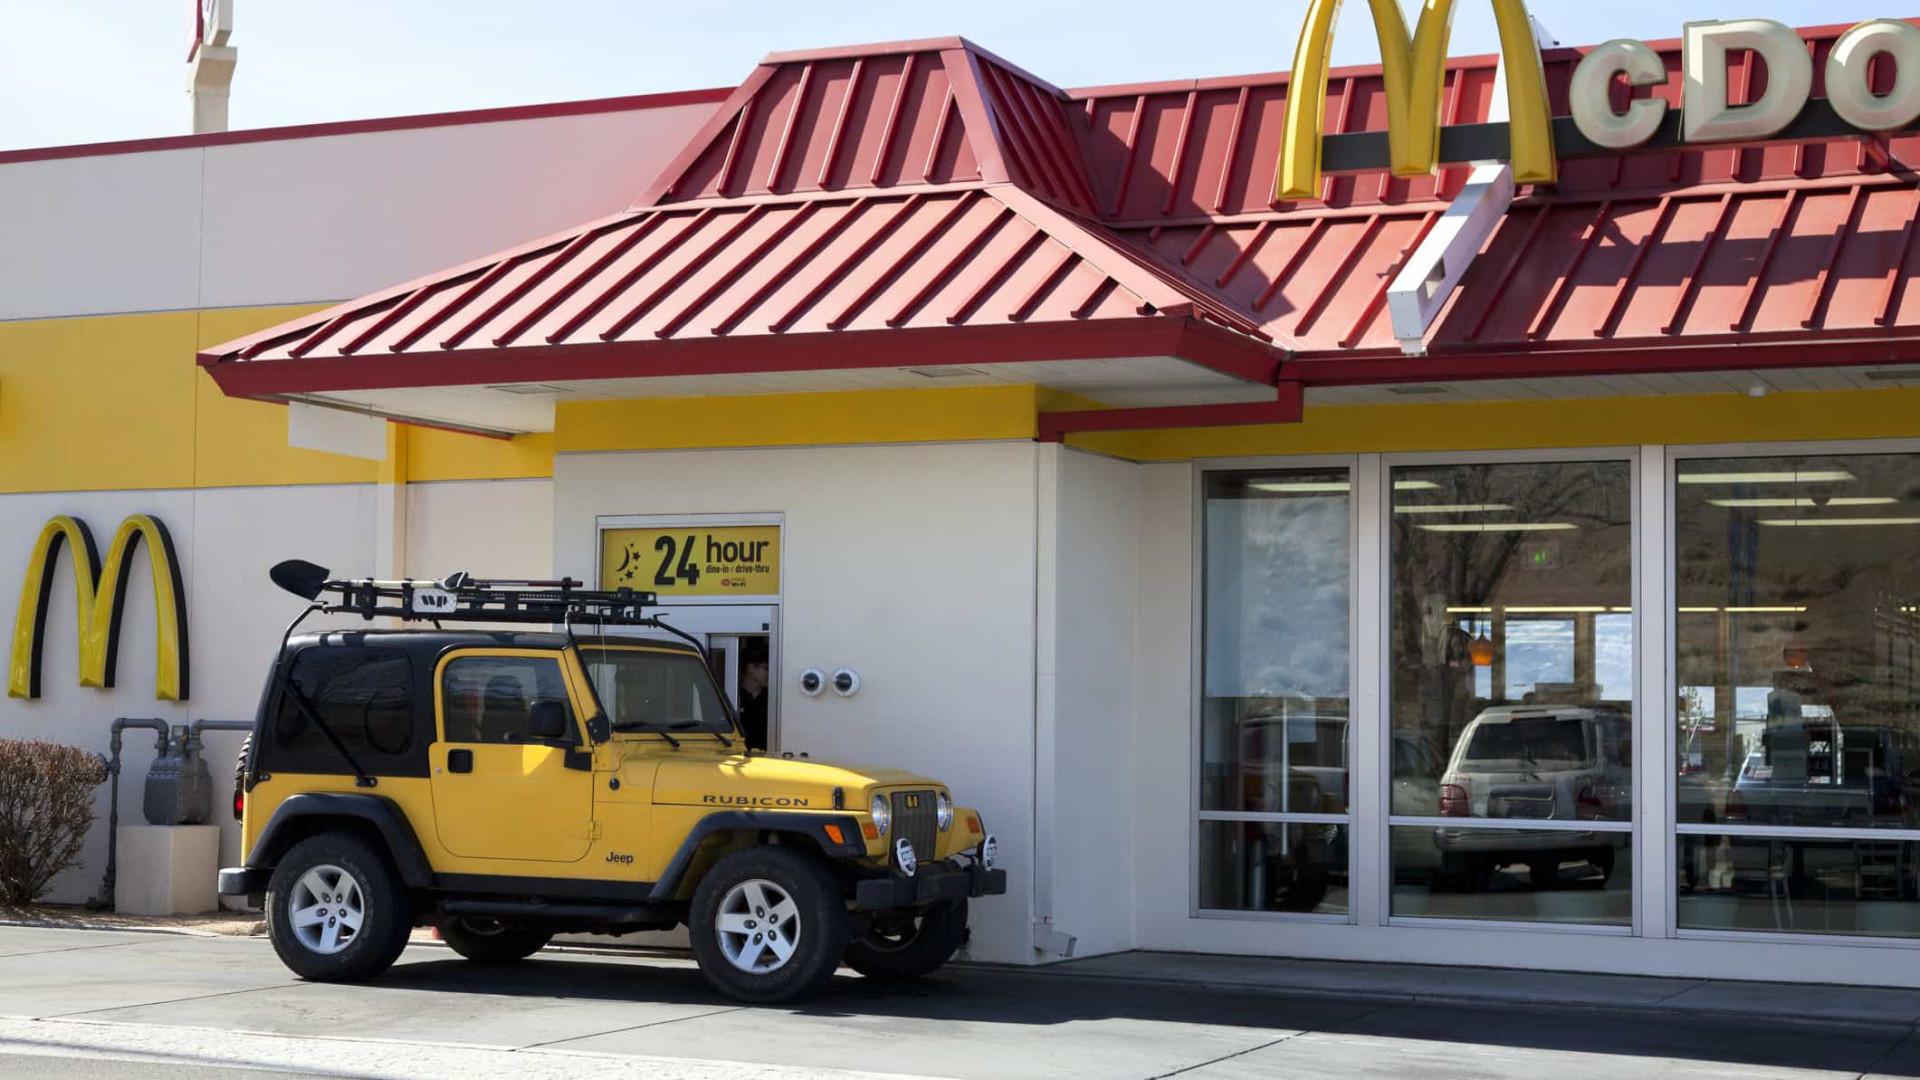 McDonald's planeja integrar tecnologia de voz e Inteligência Artificial